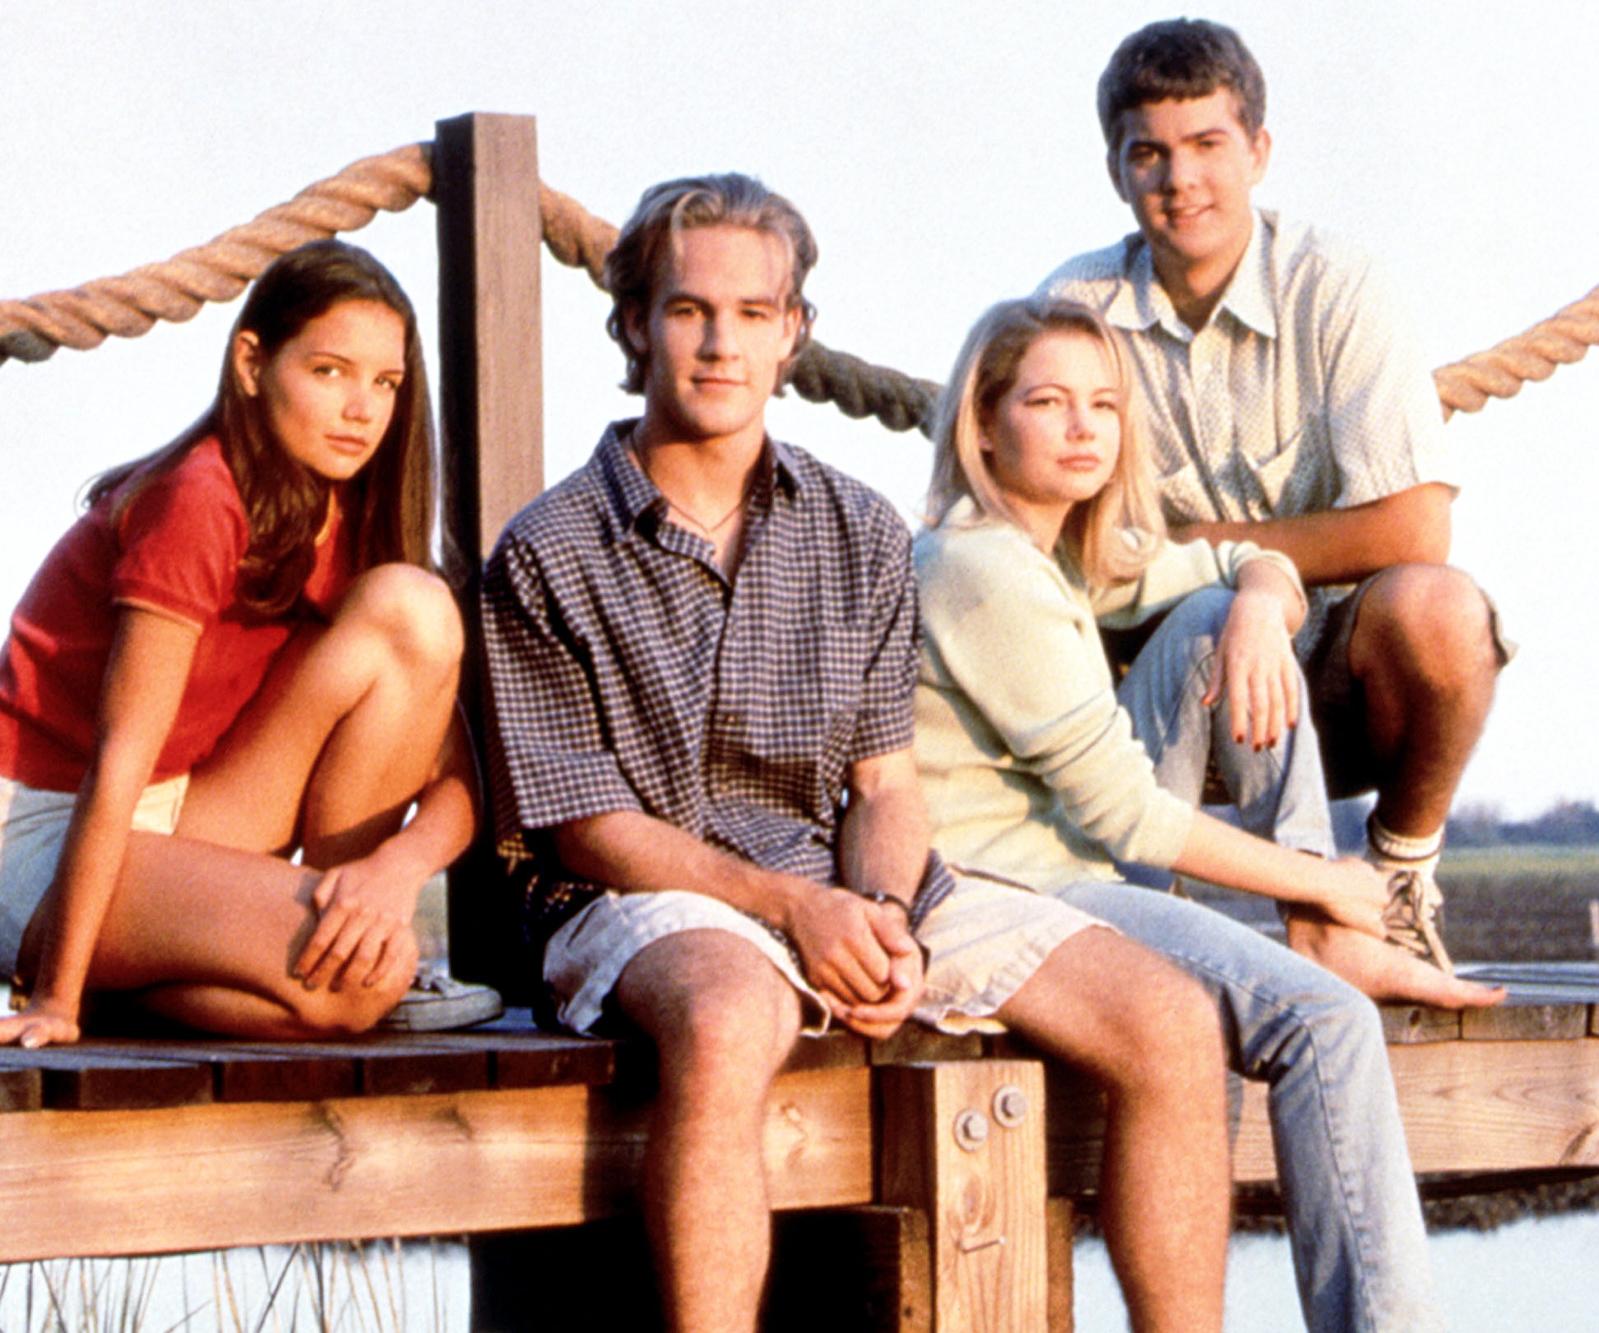 Katie Holmes, James Van Der Beek, Michelle Williams and Joshua Jackson on Season 1 of DAWSON'S CREEK